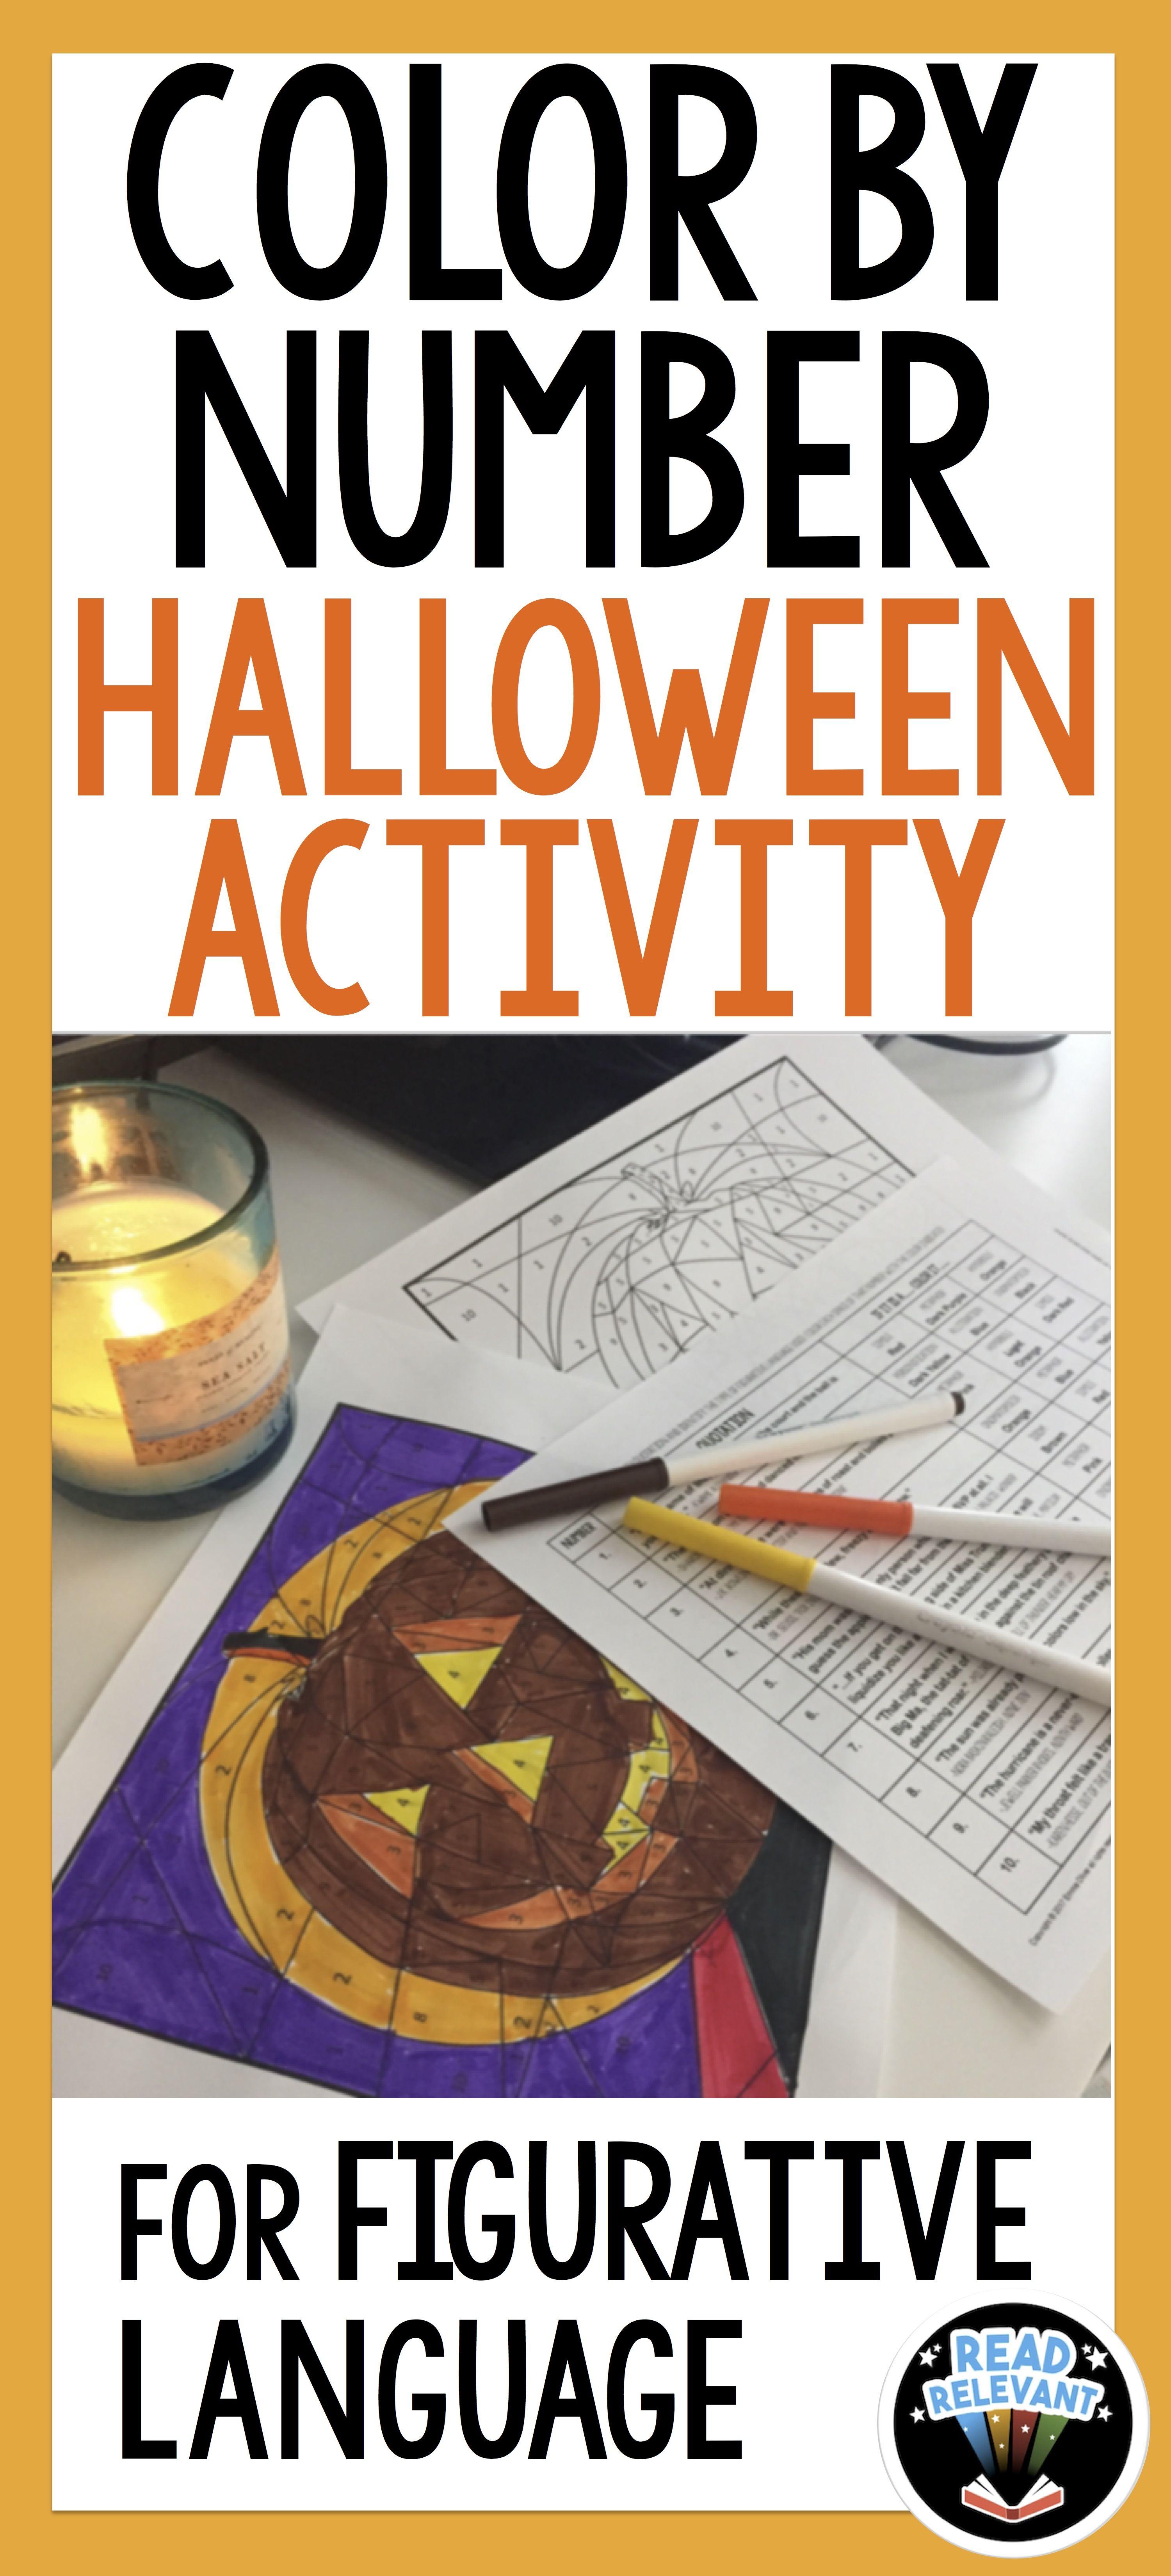 Color By Number Figurative Language Pumpkin Activity